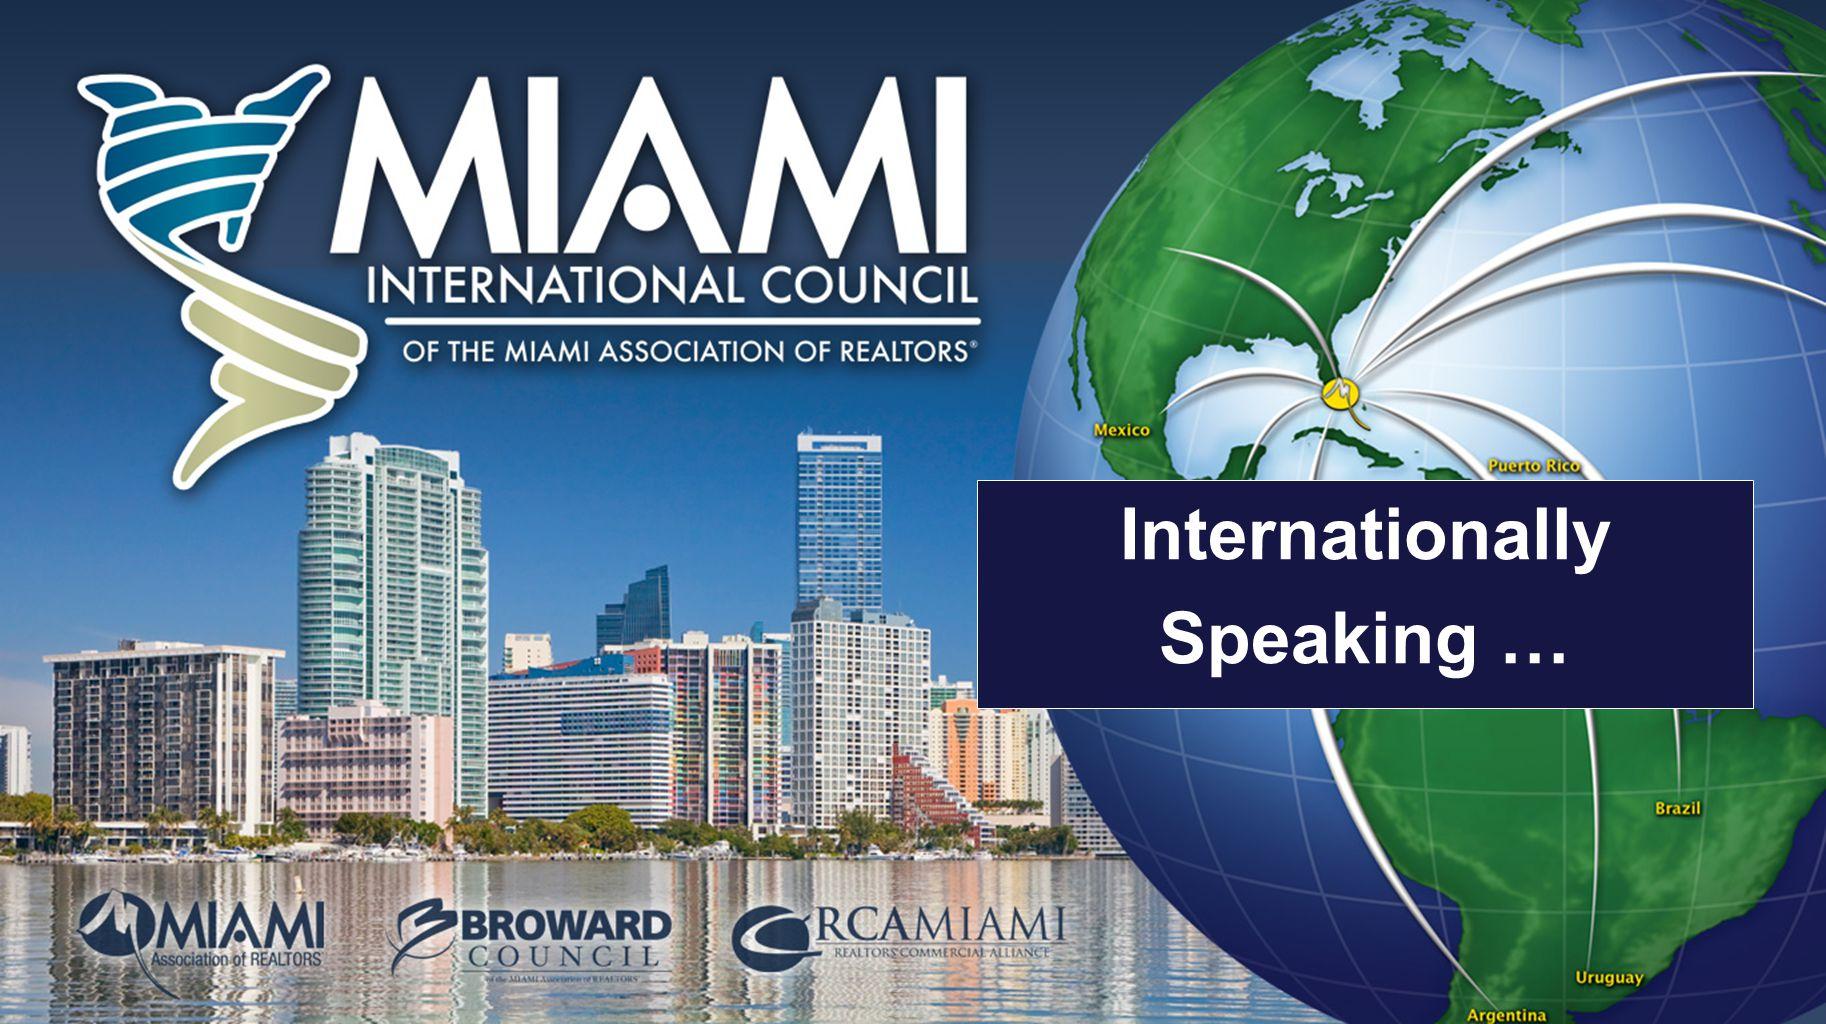 Internationally Speaking …